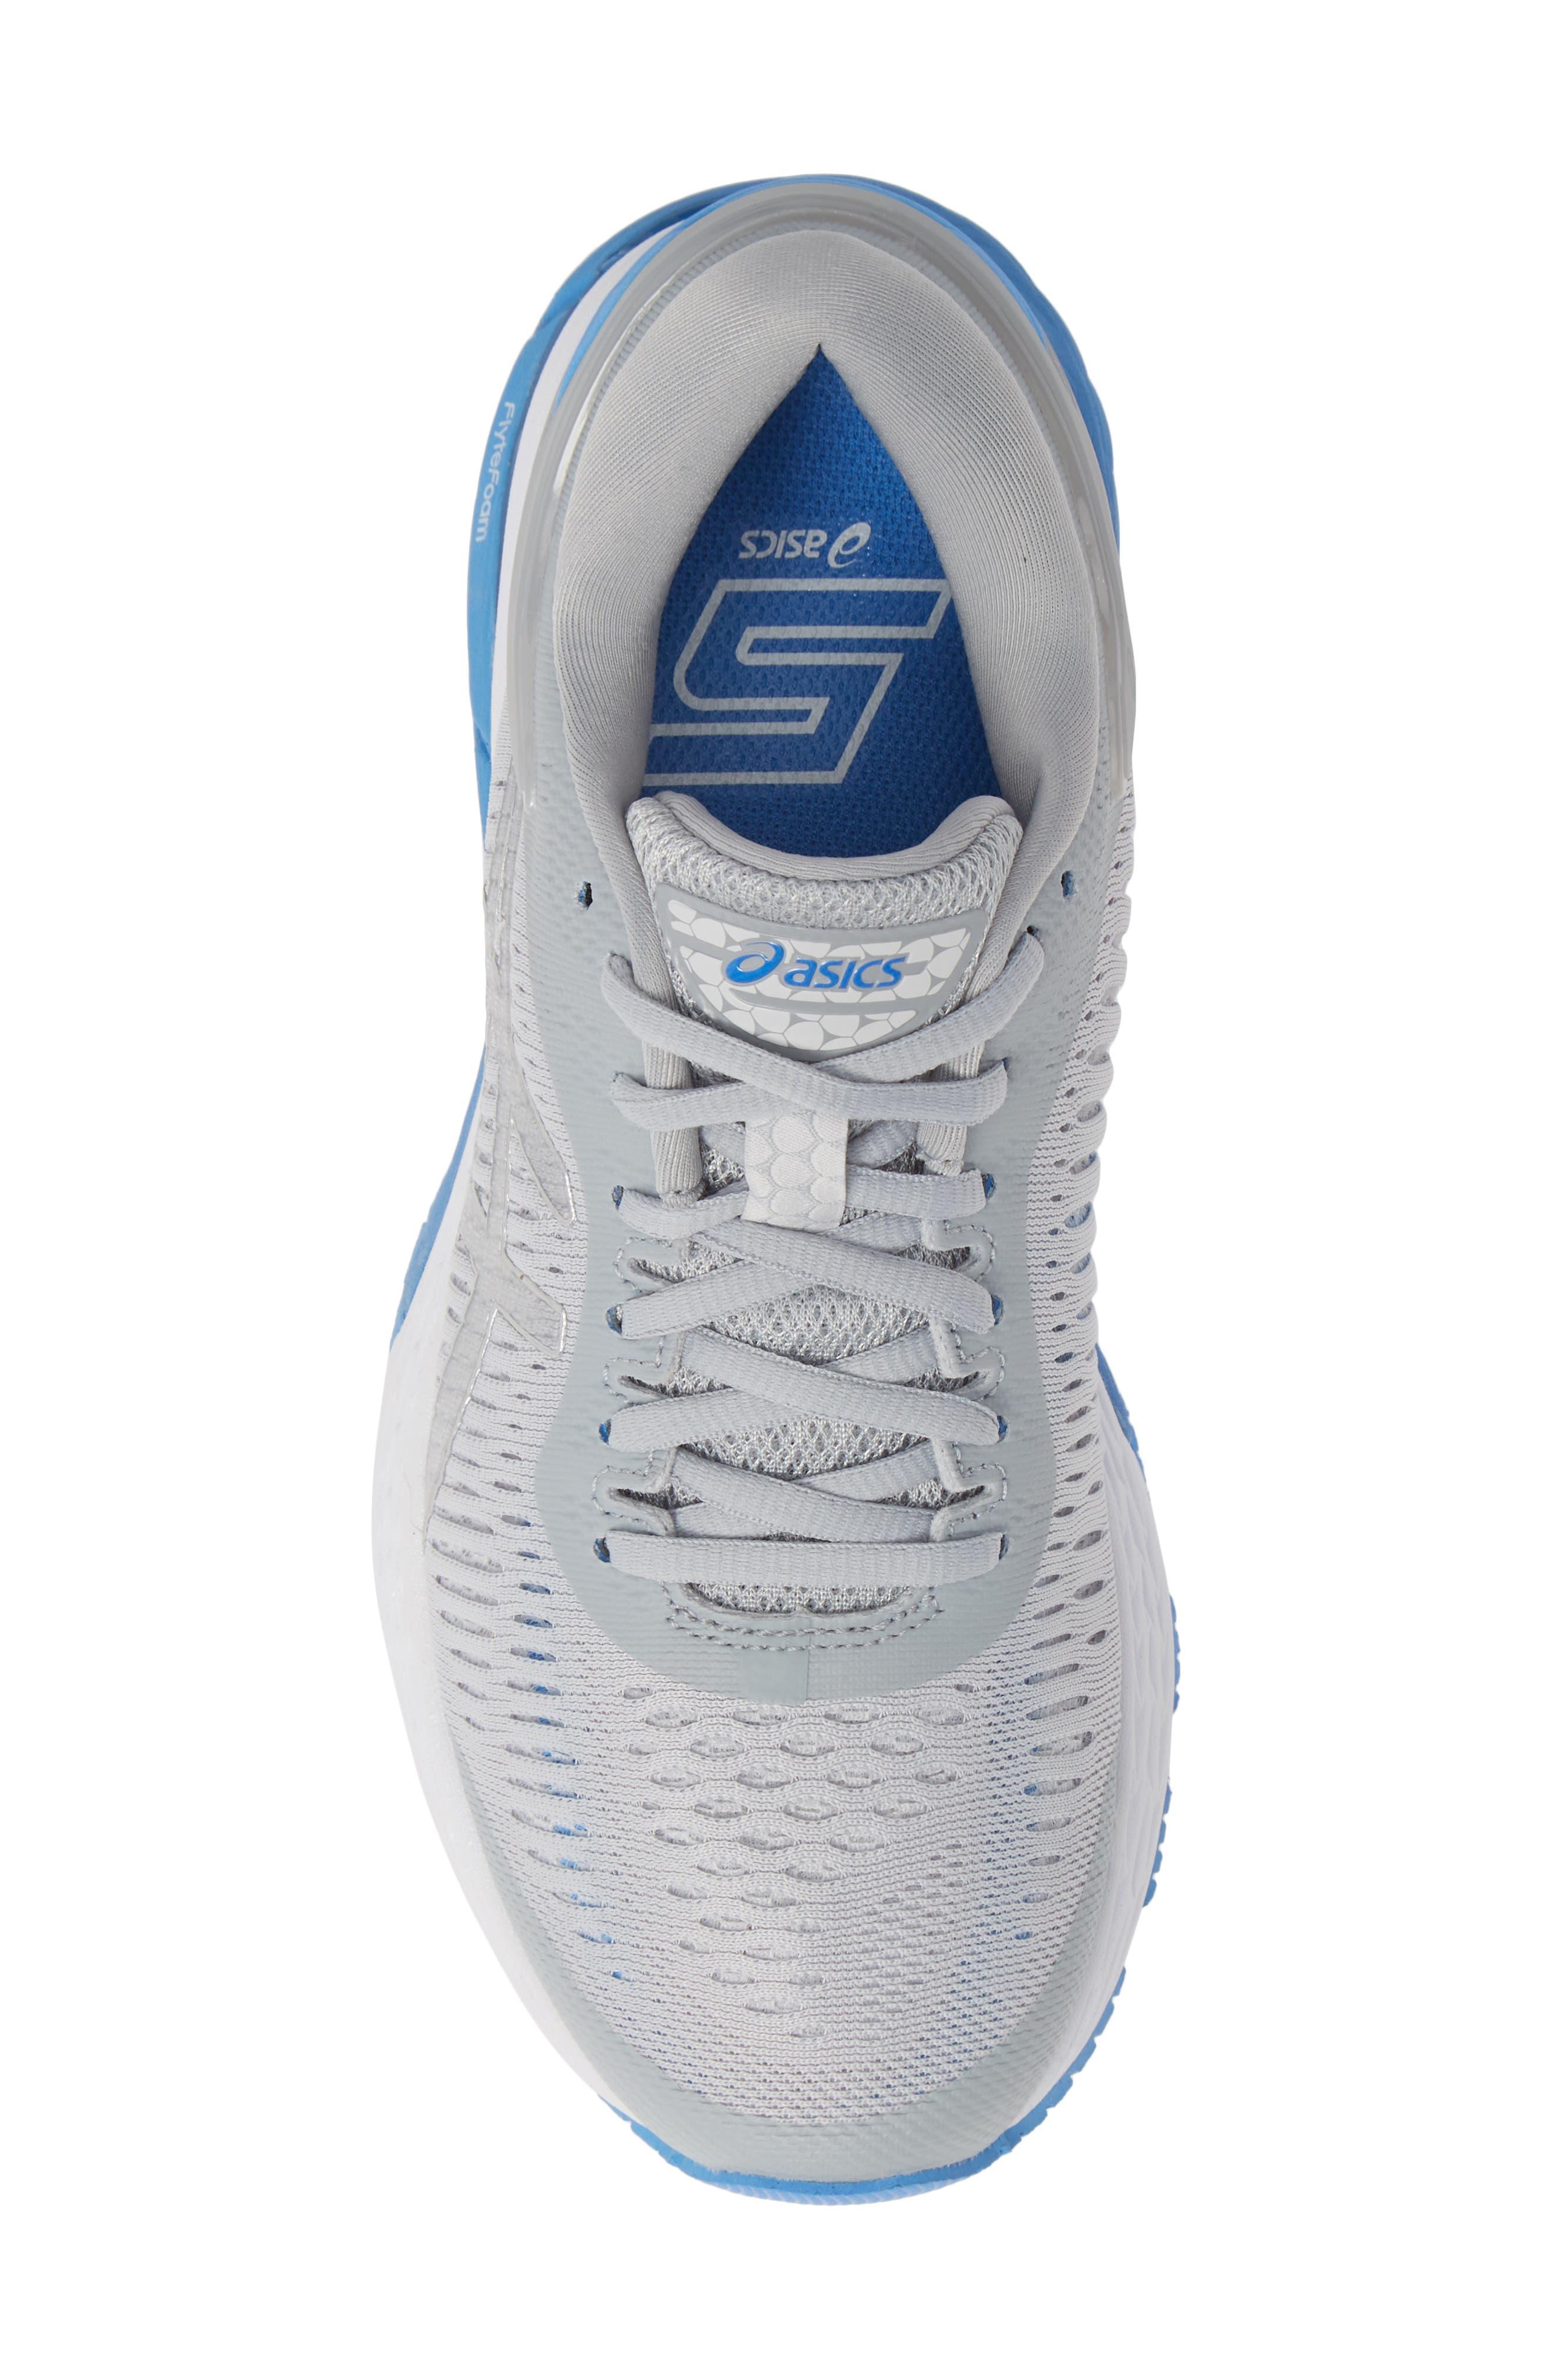 GEL-Kayano<sup>®</sup> 25 Running Shoe,                             Alternate thumbnail 5, color,                             MID GREY/ BLUE